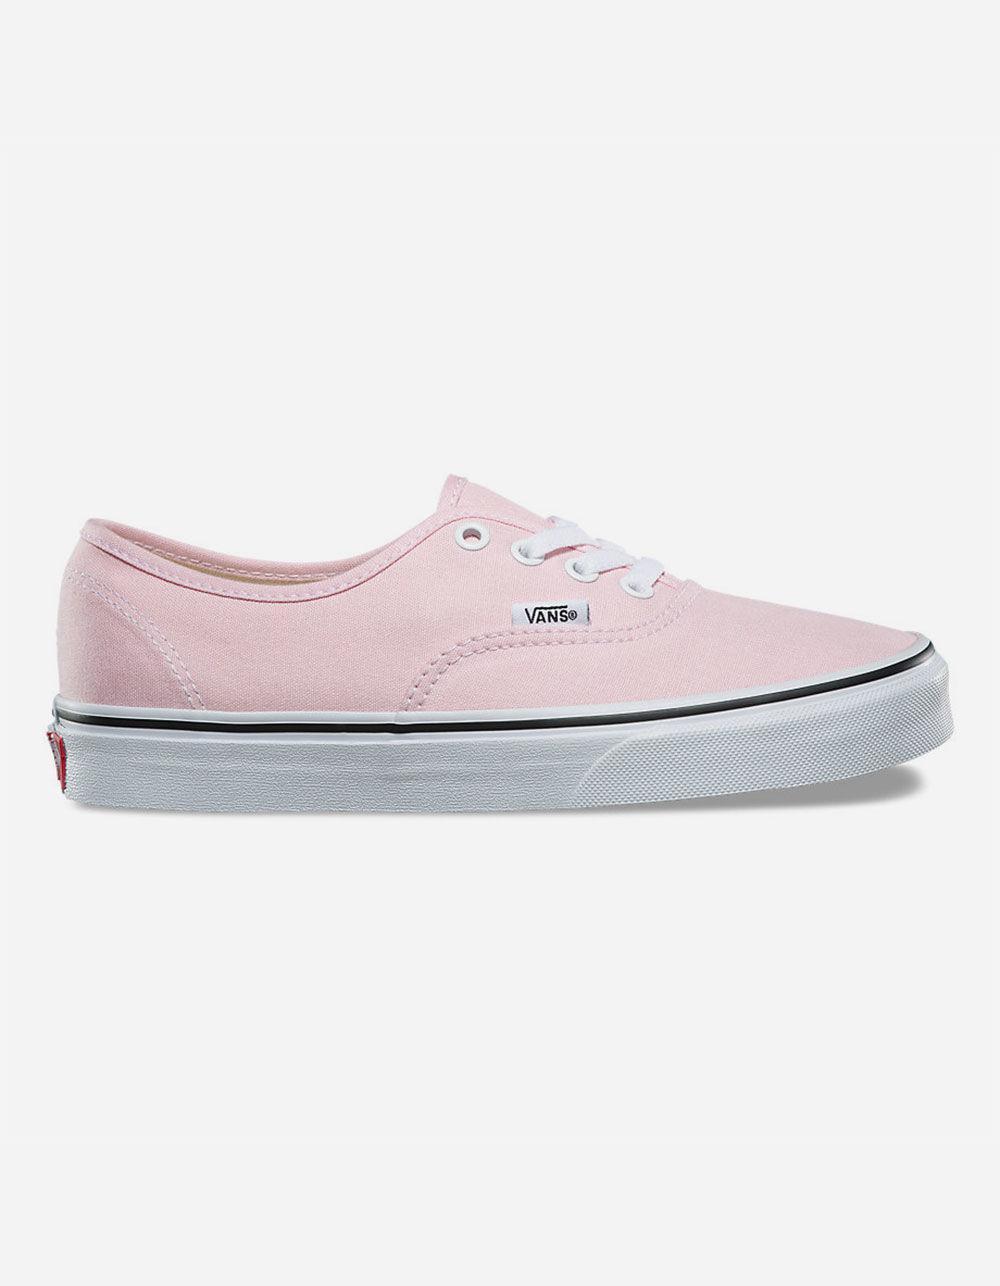 Vans Authentic Chalk Pink  True White Womens Shoes